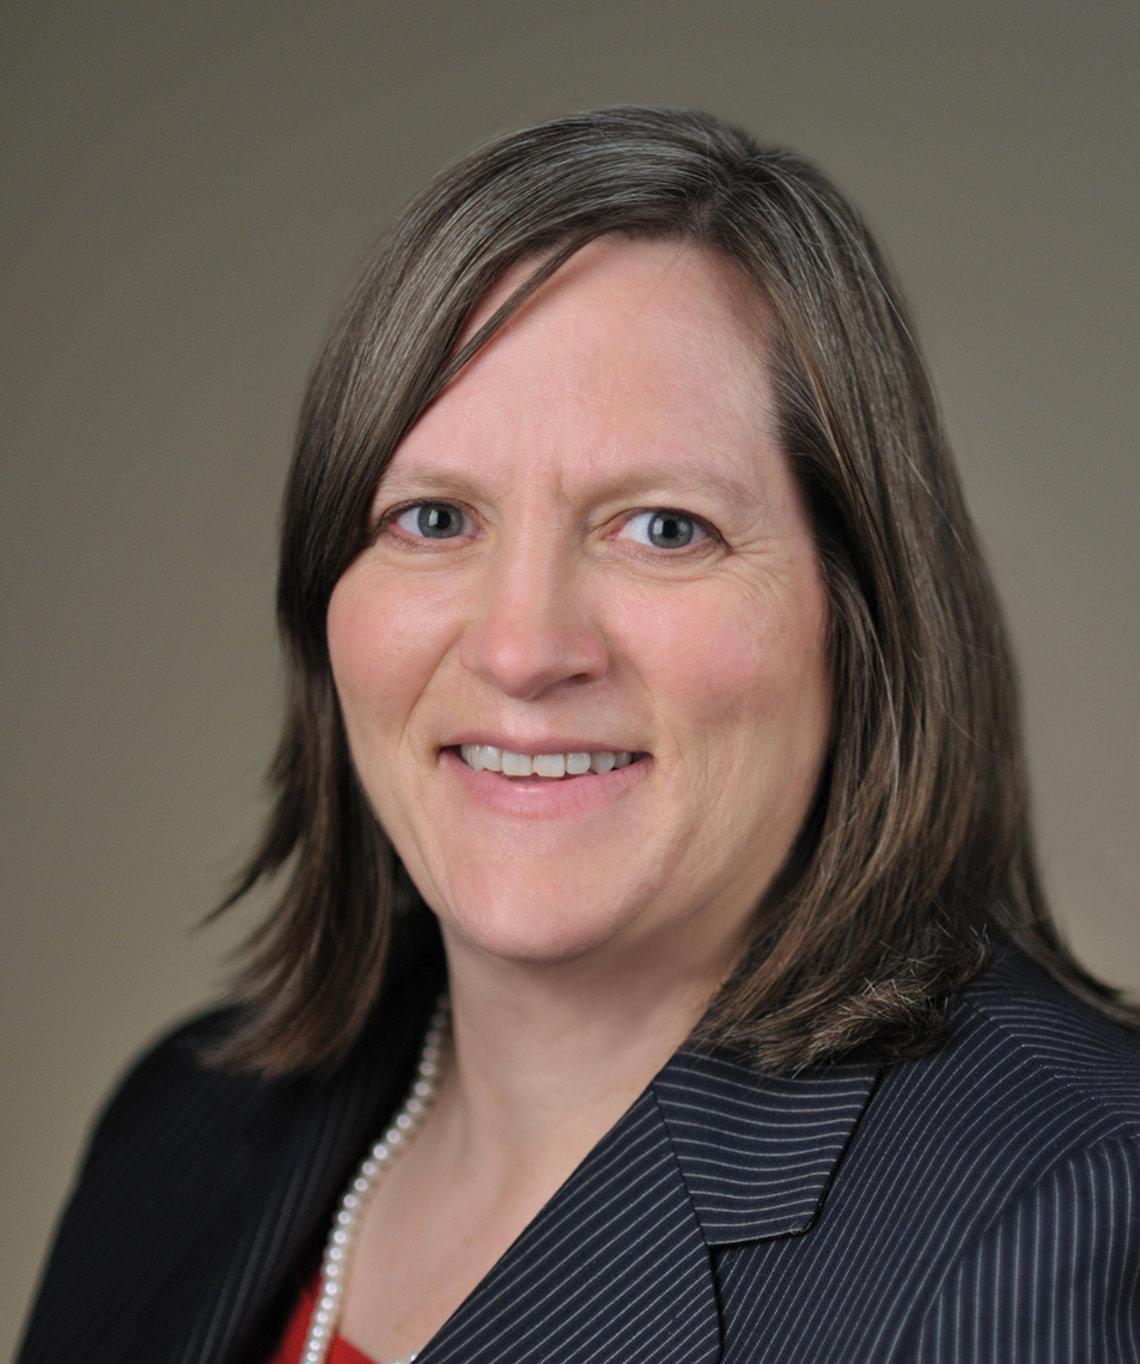 Kate O'Sullivan of NHLBI